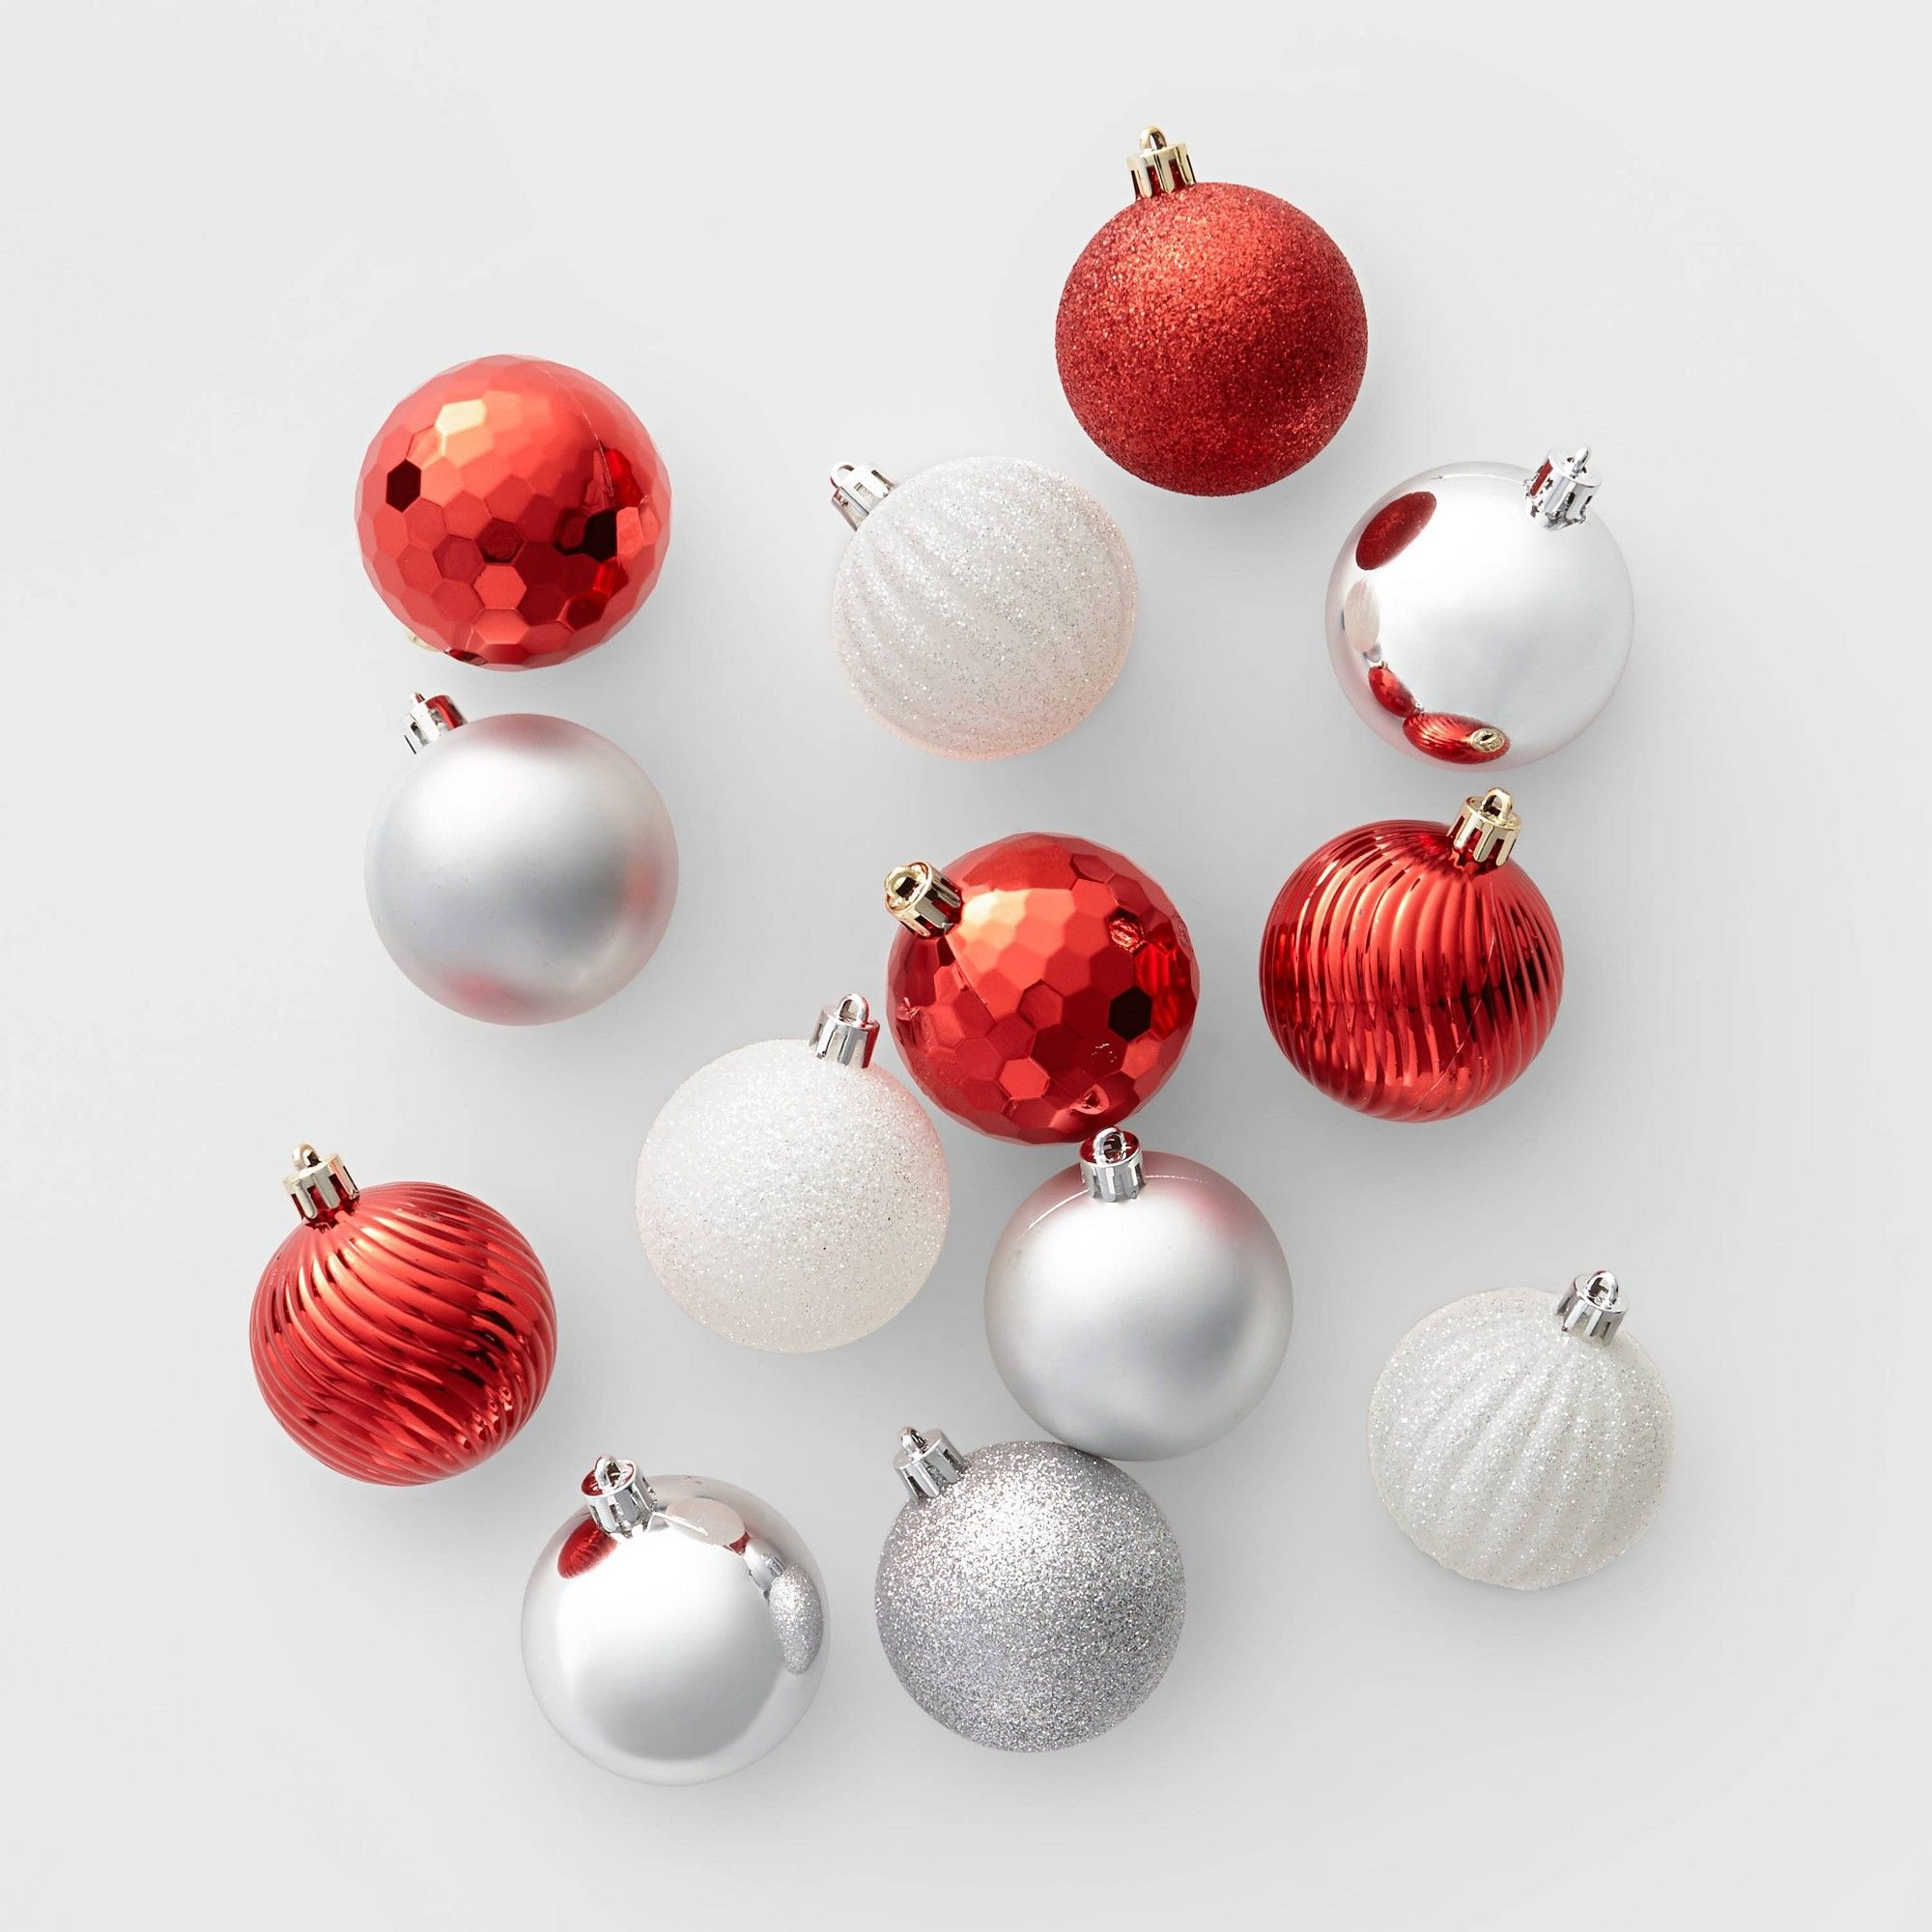 100ct Christmas Ornament Set Wine Wondershop Pink Red Gold Ornament Set Christmas Ornament Sets Christmas Ornaments